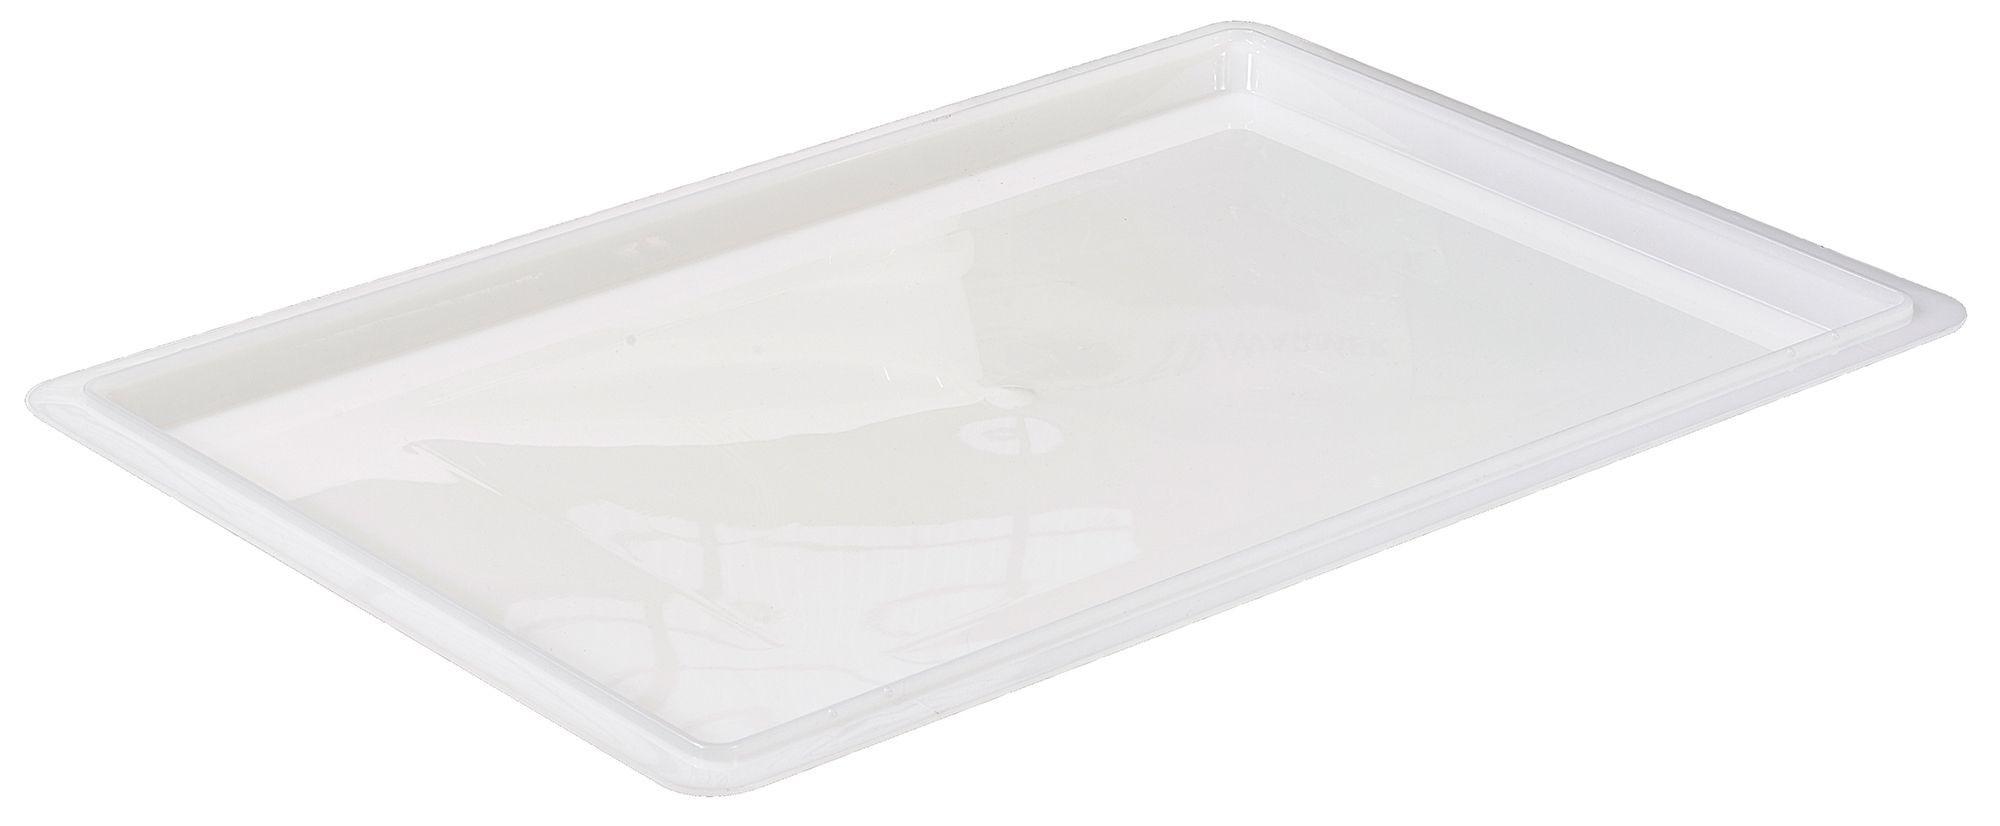 "Winco PFFW-C White 18"" x 26"" Food Storage Box Cover"